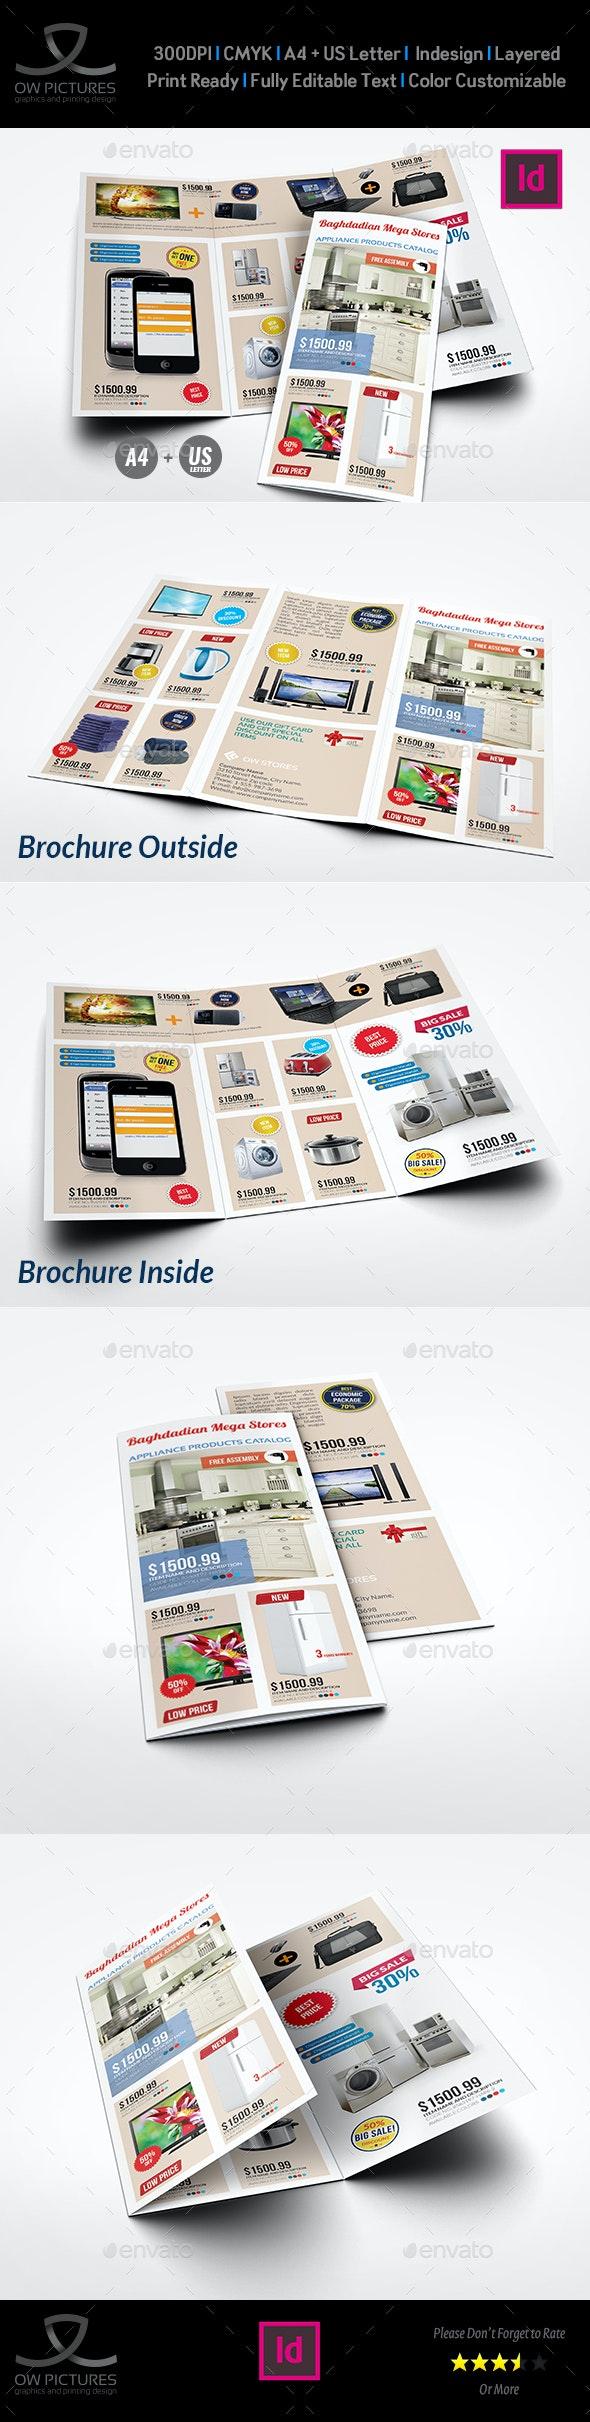 Products Catalogs Tri-Fold Brochure Template  Vol.1 - Catalogs Brochures